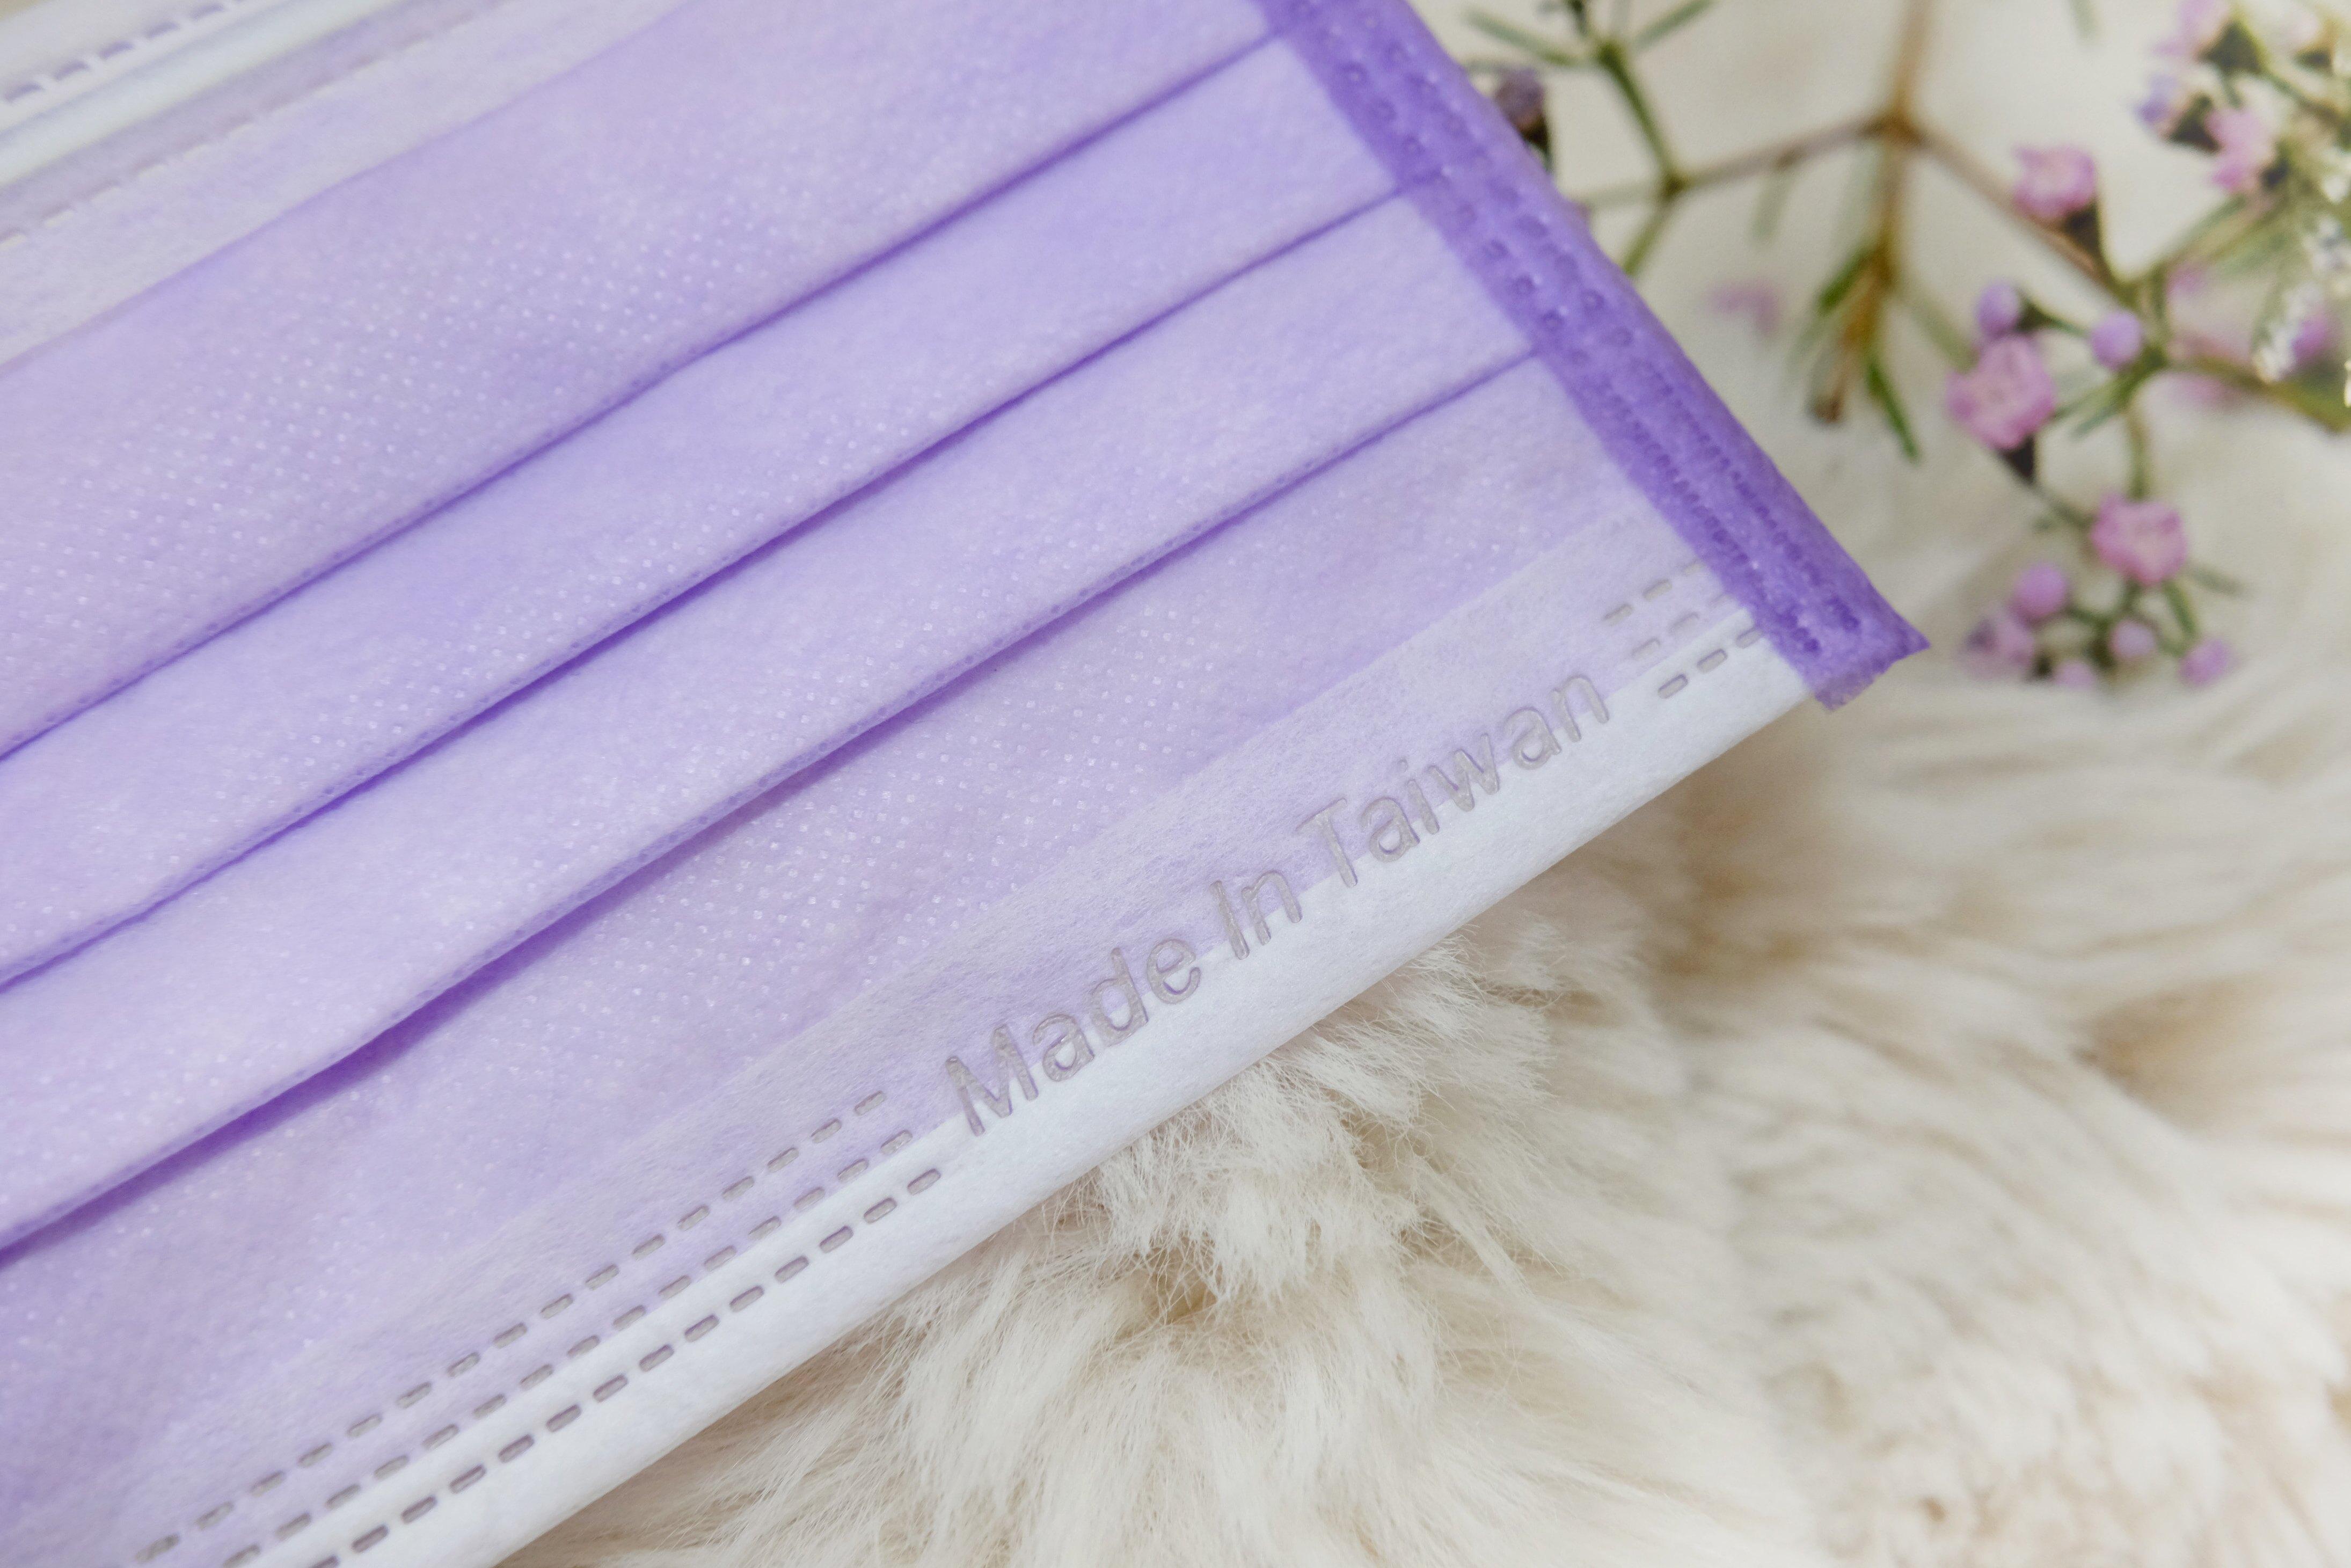 MIT醫用口罩3包+袖珍包衛生紙1袋|防疫安心組